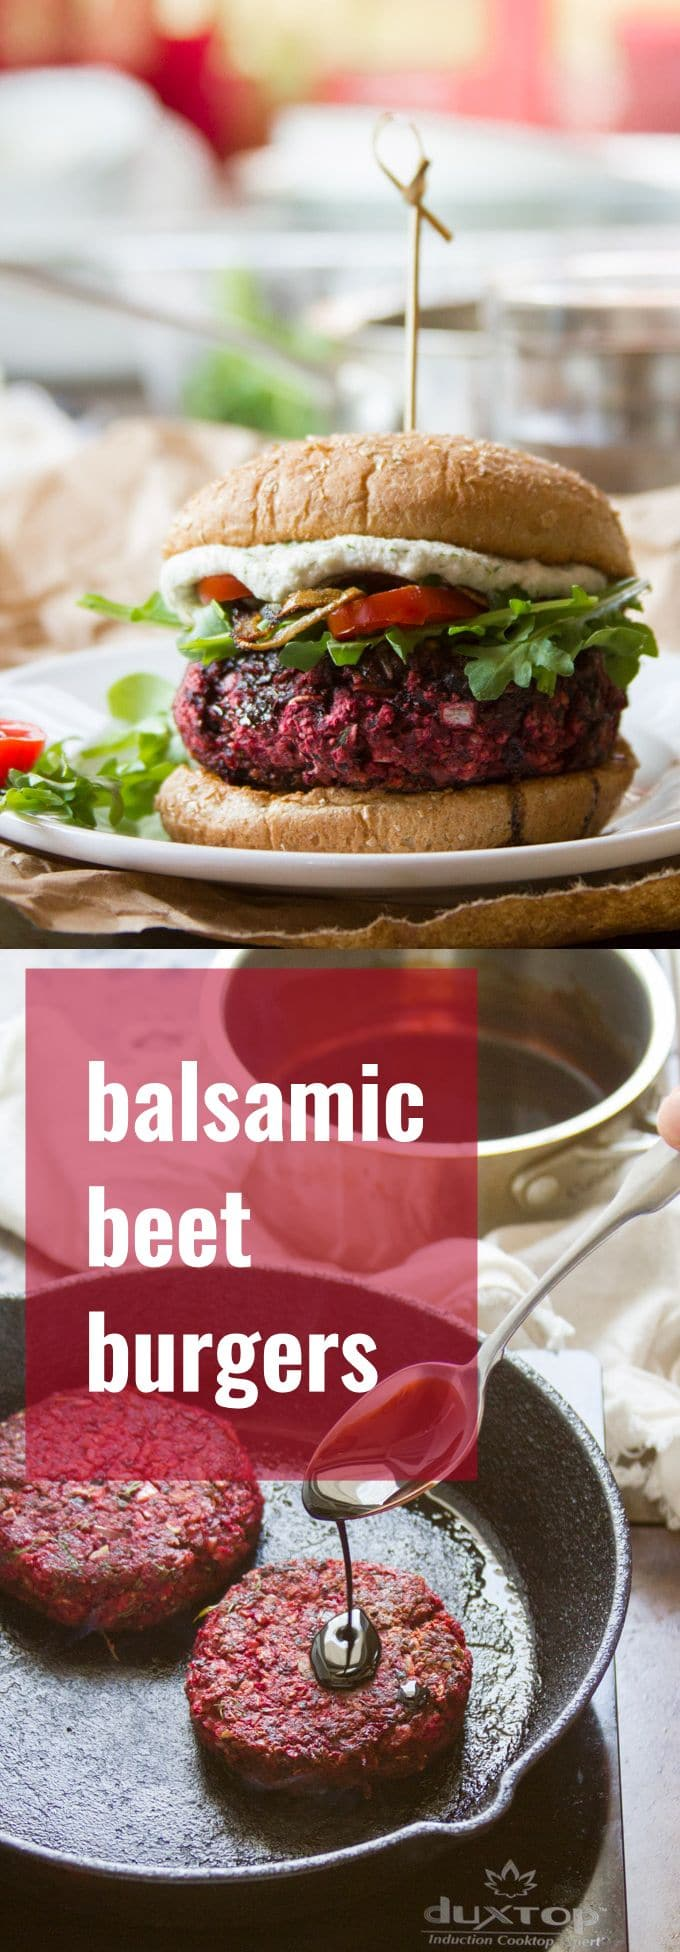 Balsamic Beet Burgers